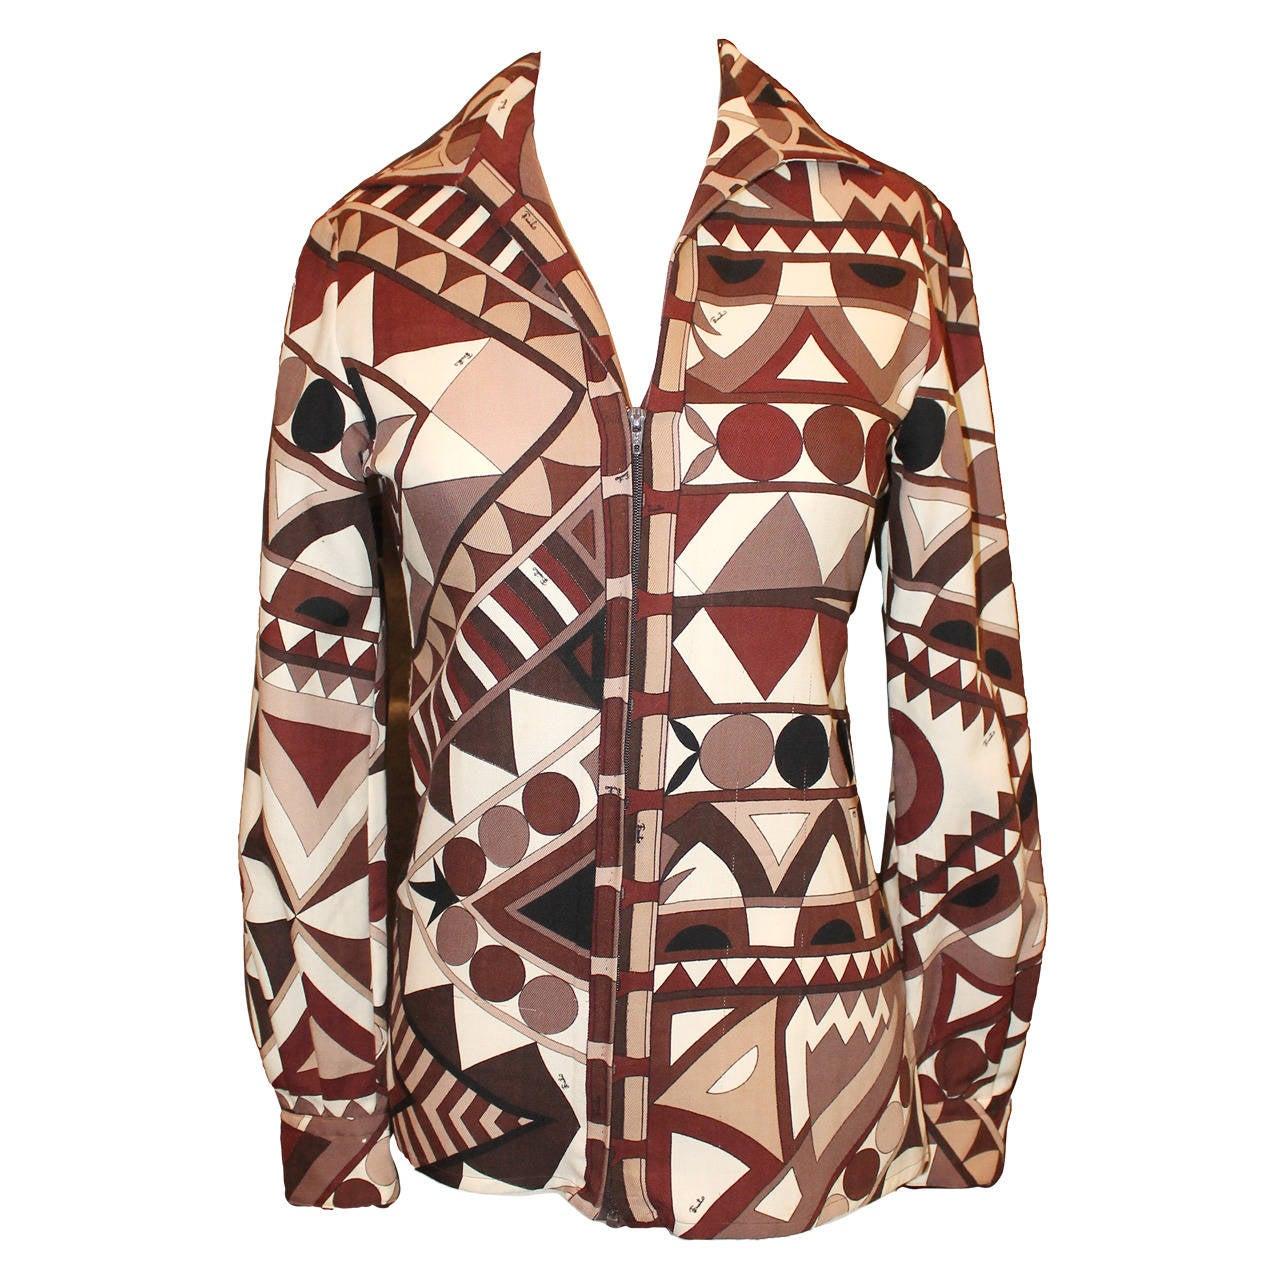 Pucci Vinatge Brown Geomtric Print Jacket/Shirt - circa 1960s - S